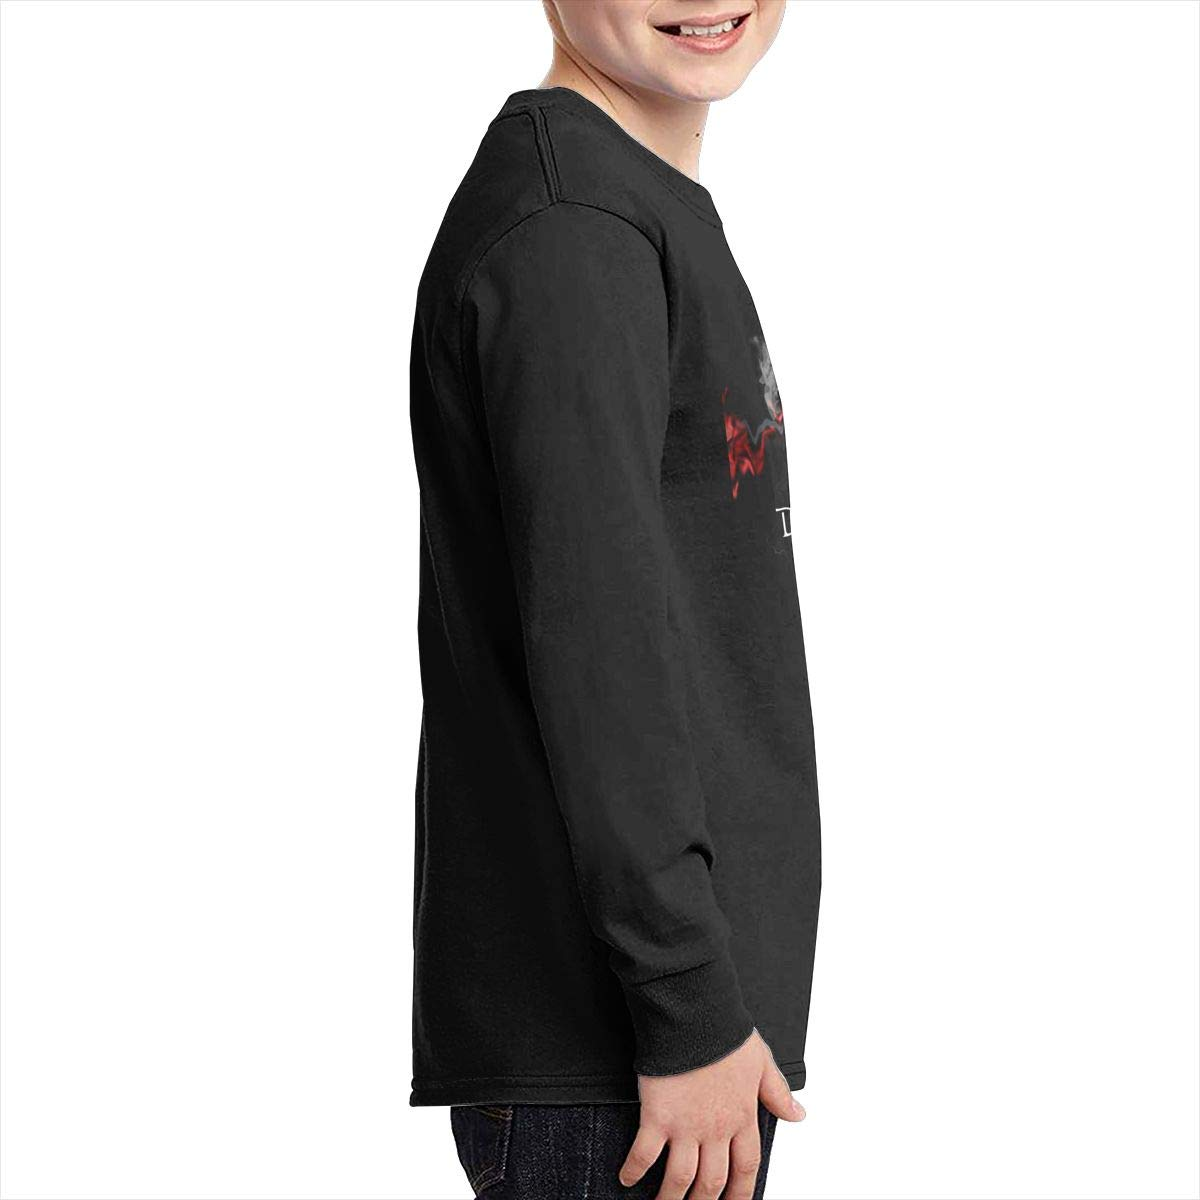 RhteGui Dream Theater Boys /& Girls Junior Vintage Long Sleeve T-Shirt Black